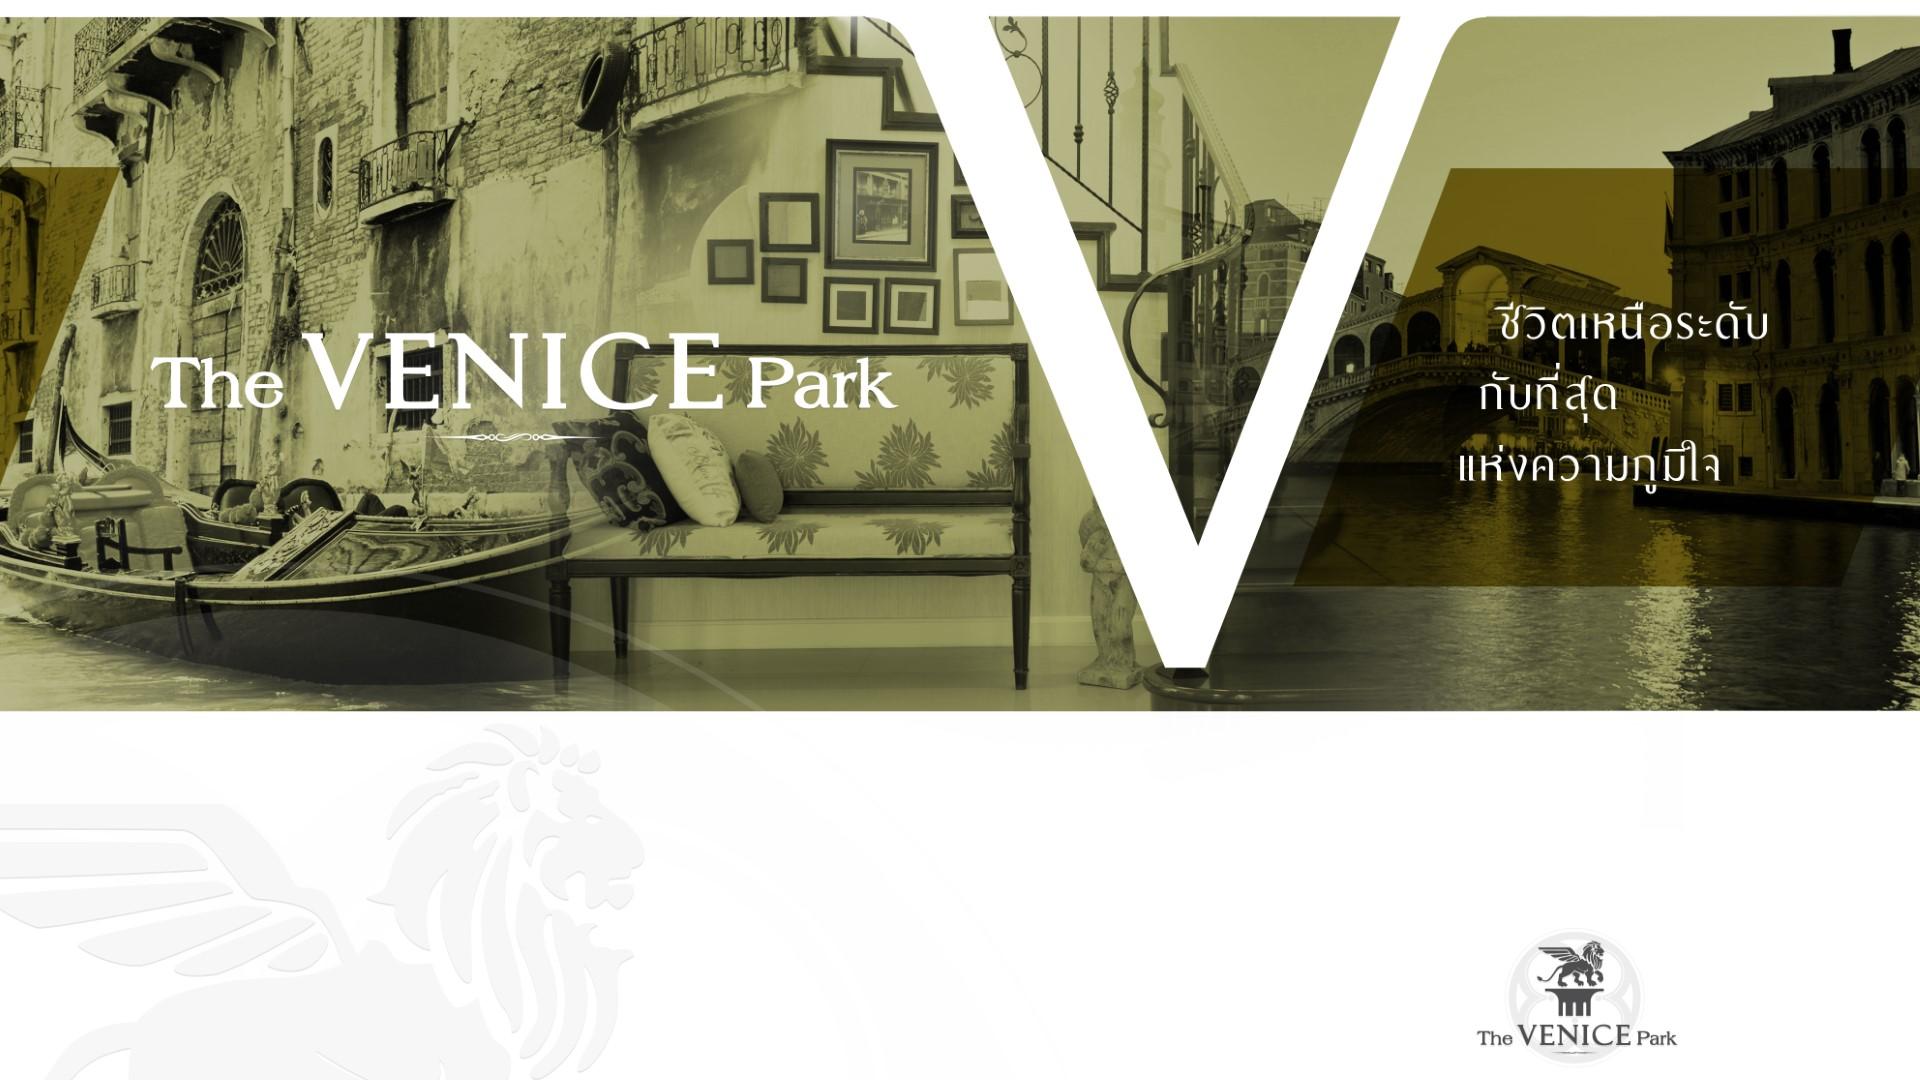 The venice park korat